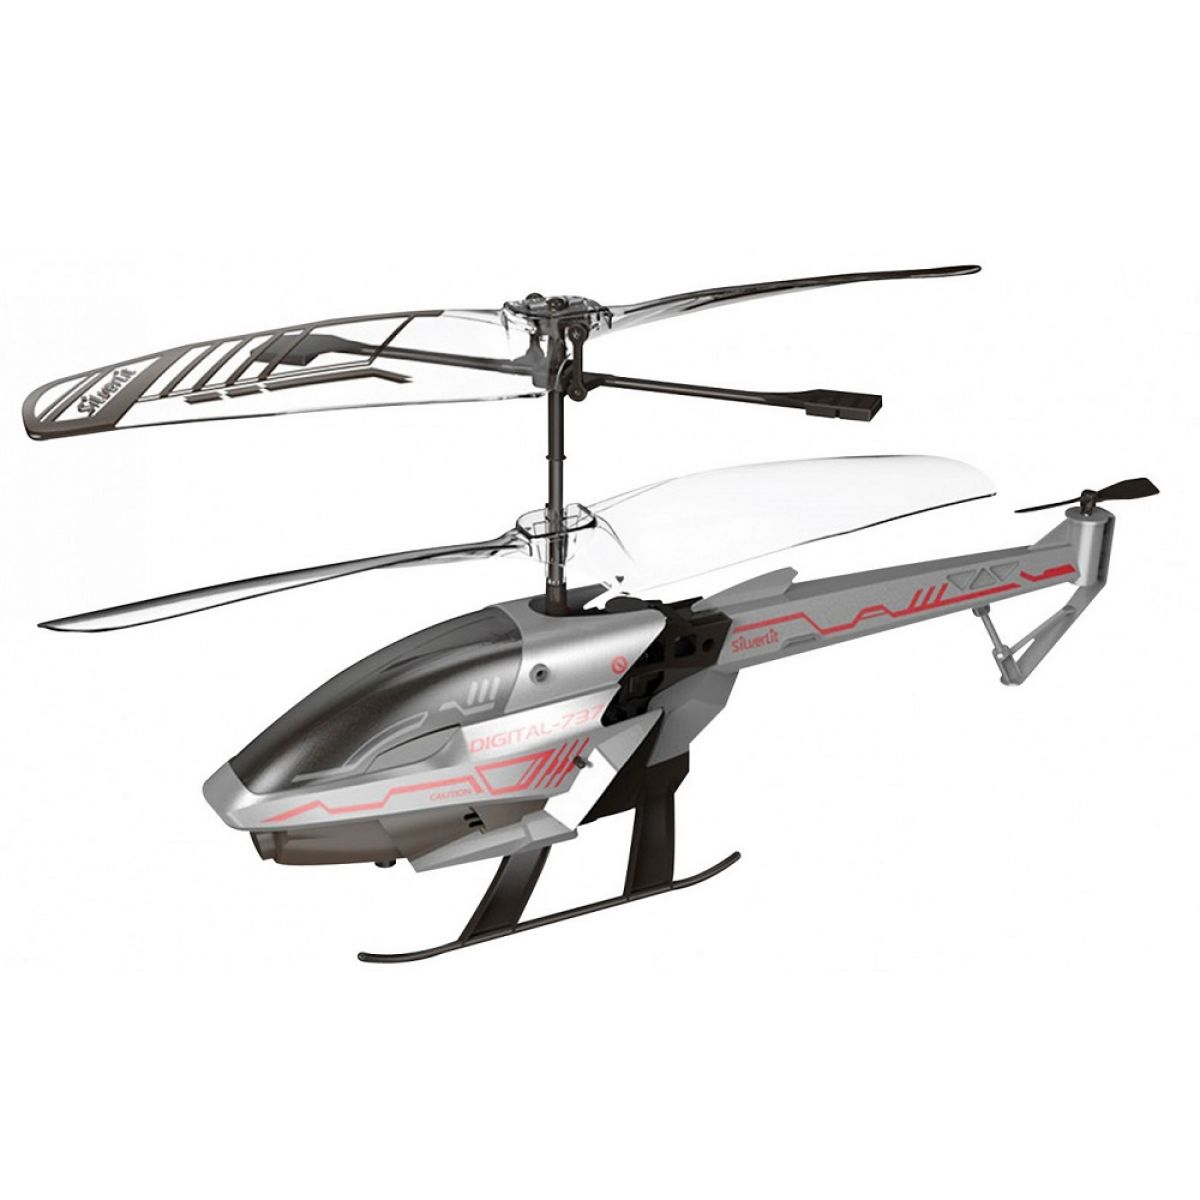 SILVERLIT RC helikoptéra Spy Cam III s kamerou šedá